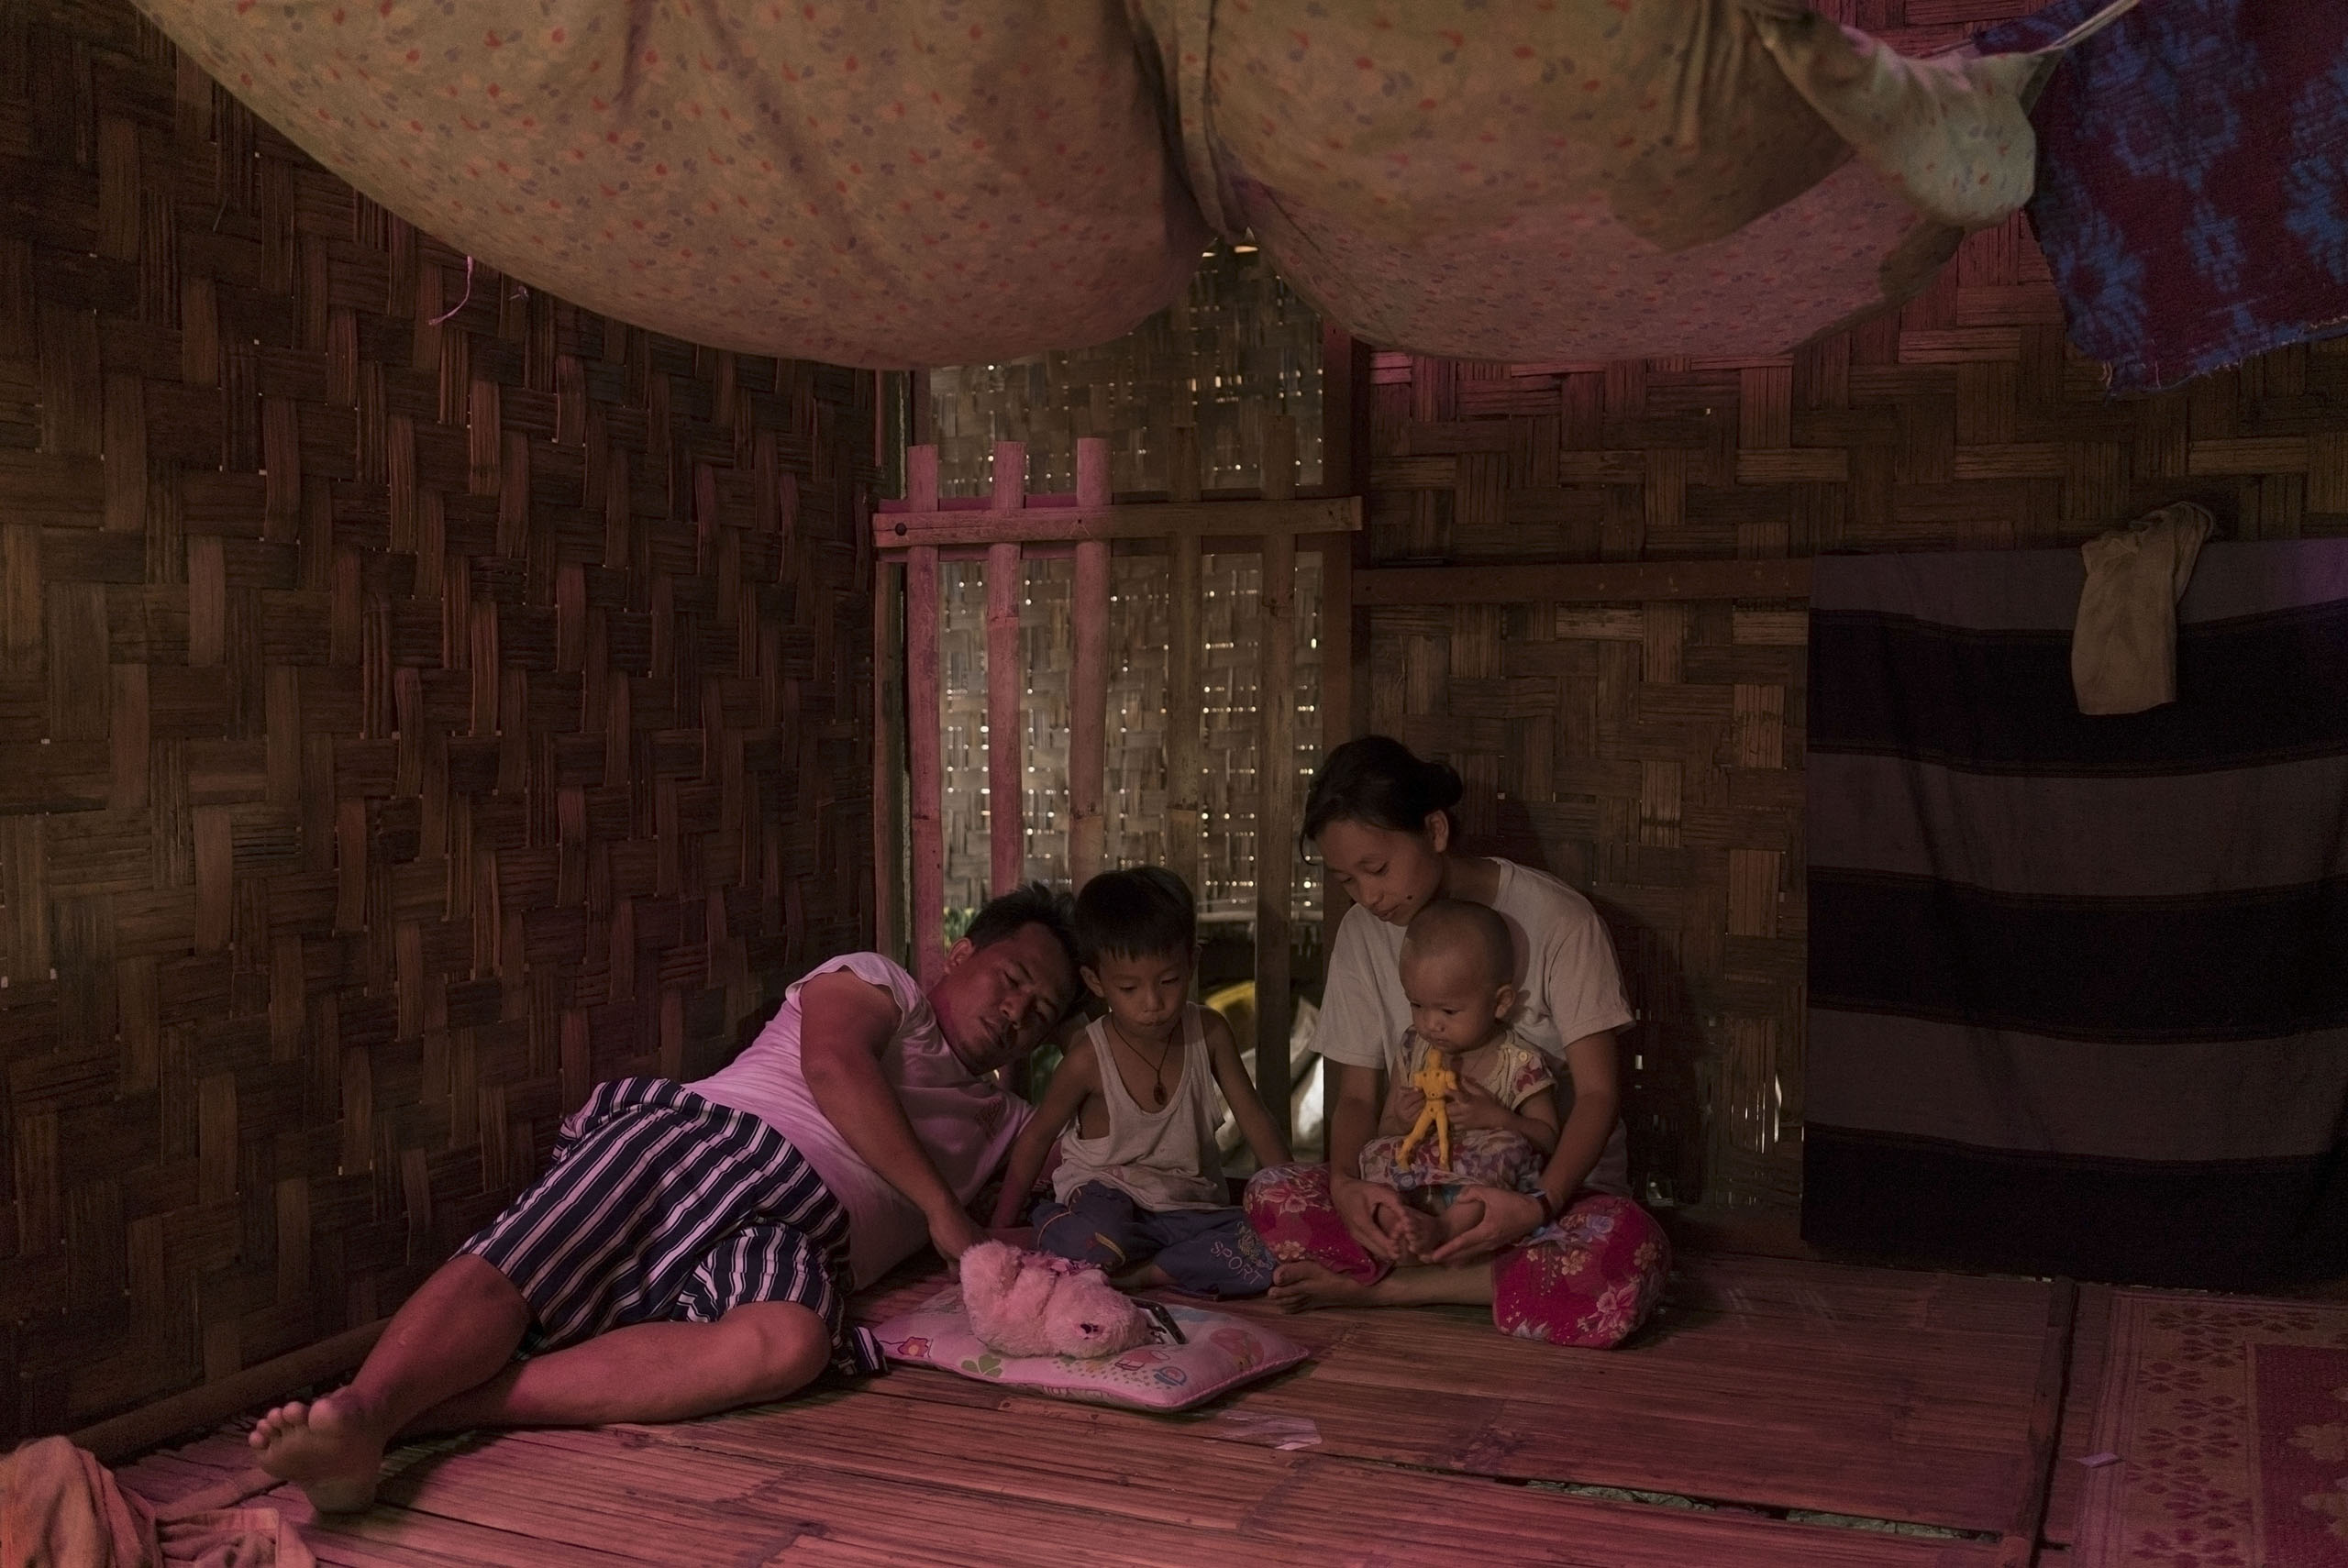 An internally displaced people (IDP) camp of ethnic Kachin people, Myitkyina, Myanmar, May, 2016.